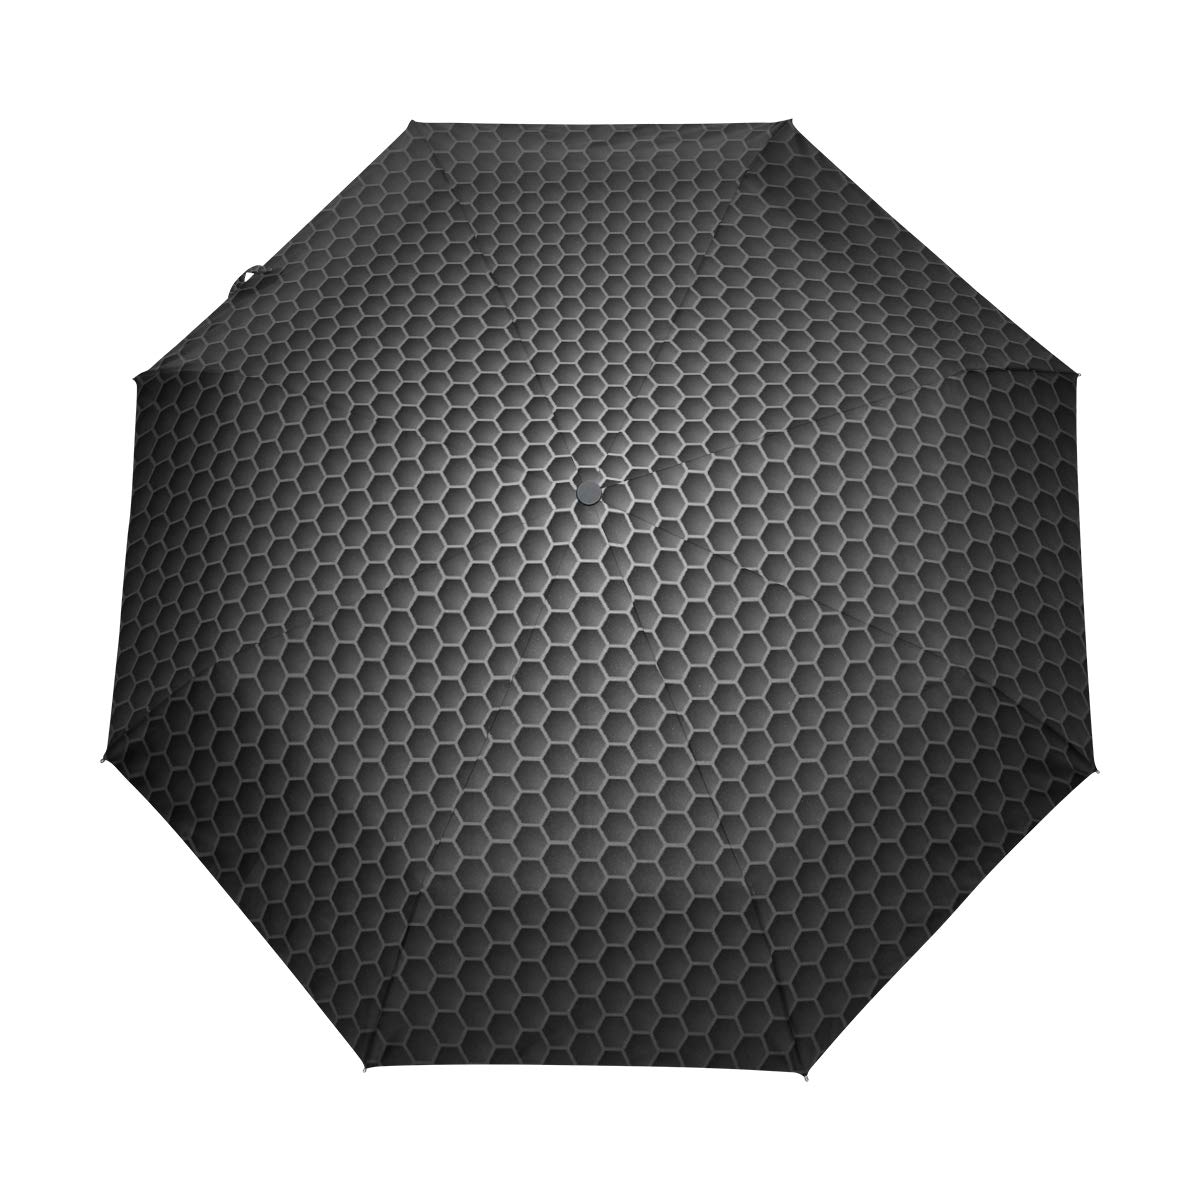 Wave ブラック ホワイト 自動折りたたみ傘 UV保護 自動開閉 折りたたみ式 防風 日よけ 旅行 ビーチ レディース キッズ 10.5 In x 5 In x 12.5 In グレー FV-007 B07G8M4VKY パターン2